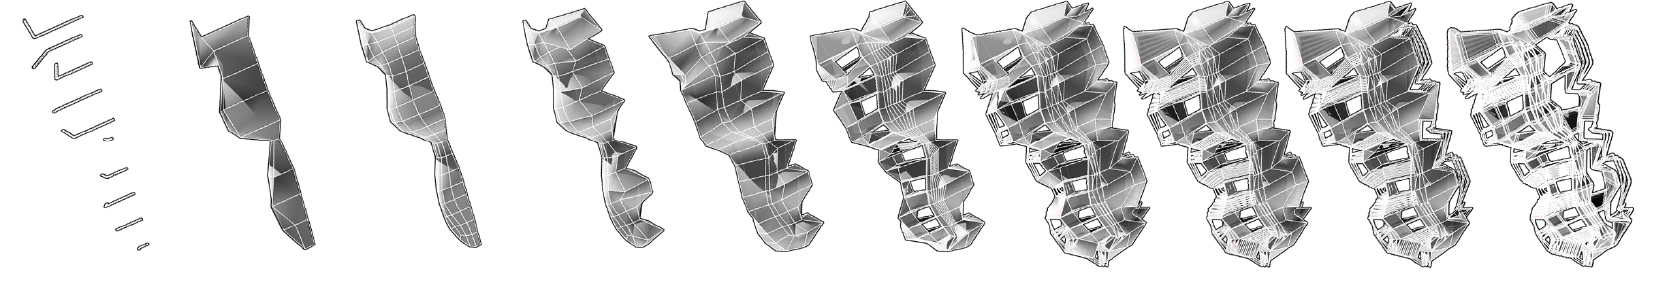 Flori_Kryethi_compiled-17 copy.jpg